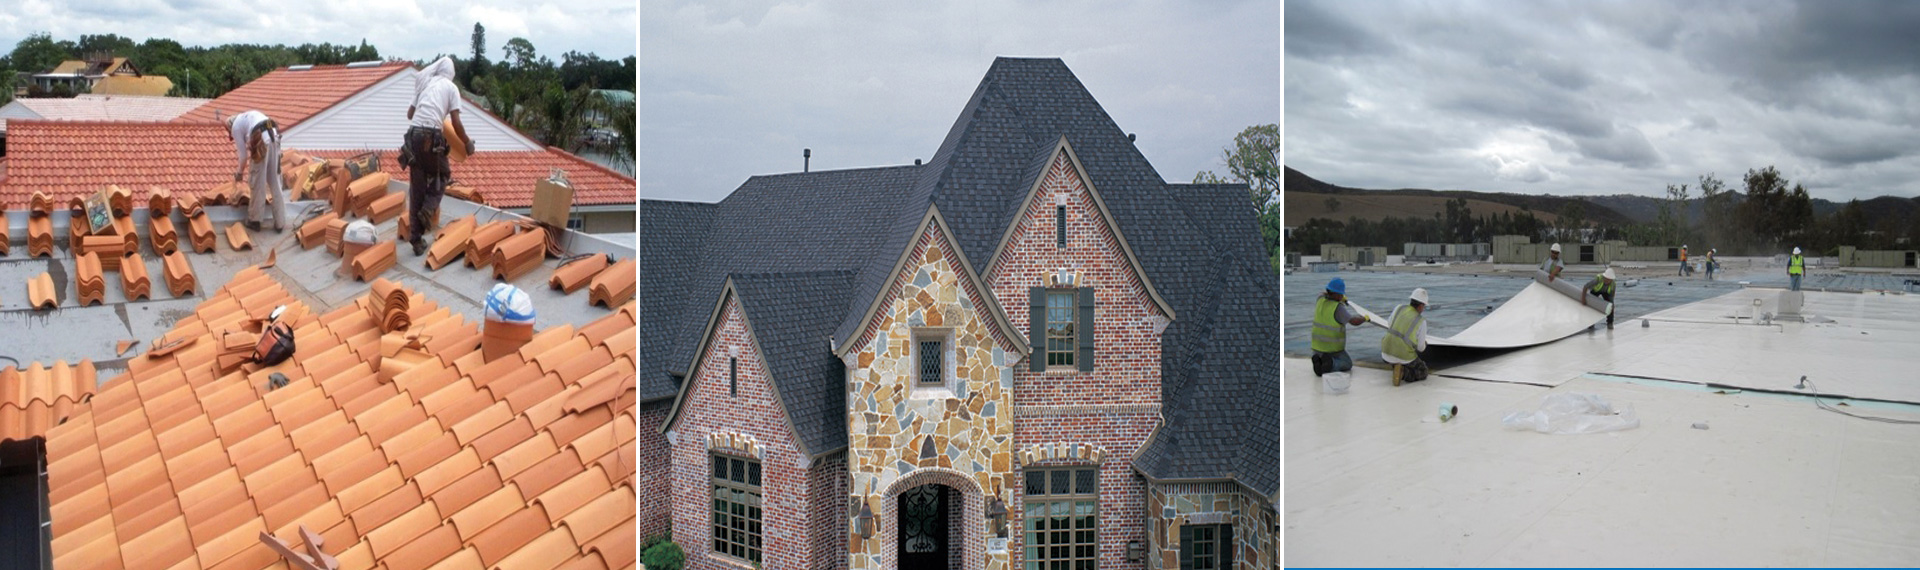 Expedite Roofing INC Frisco TX